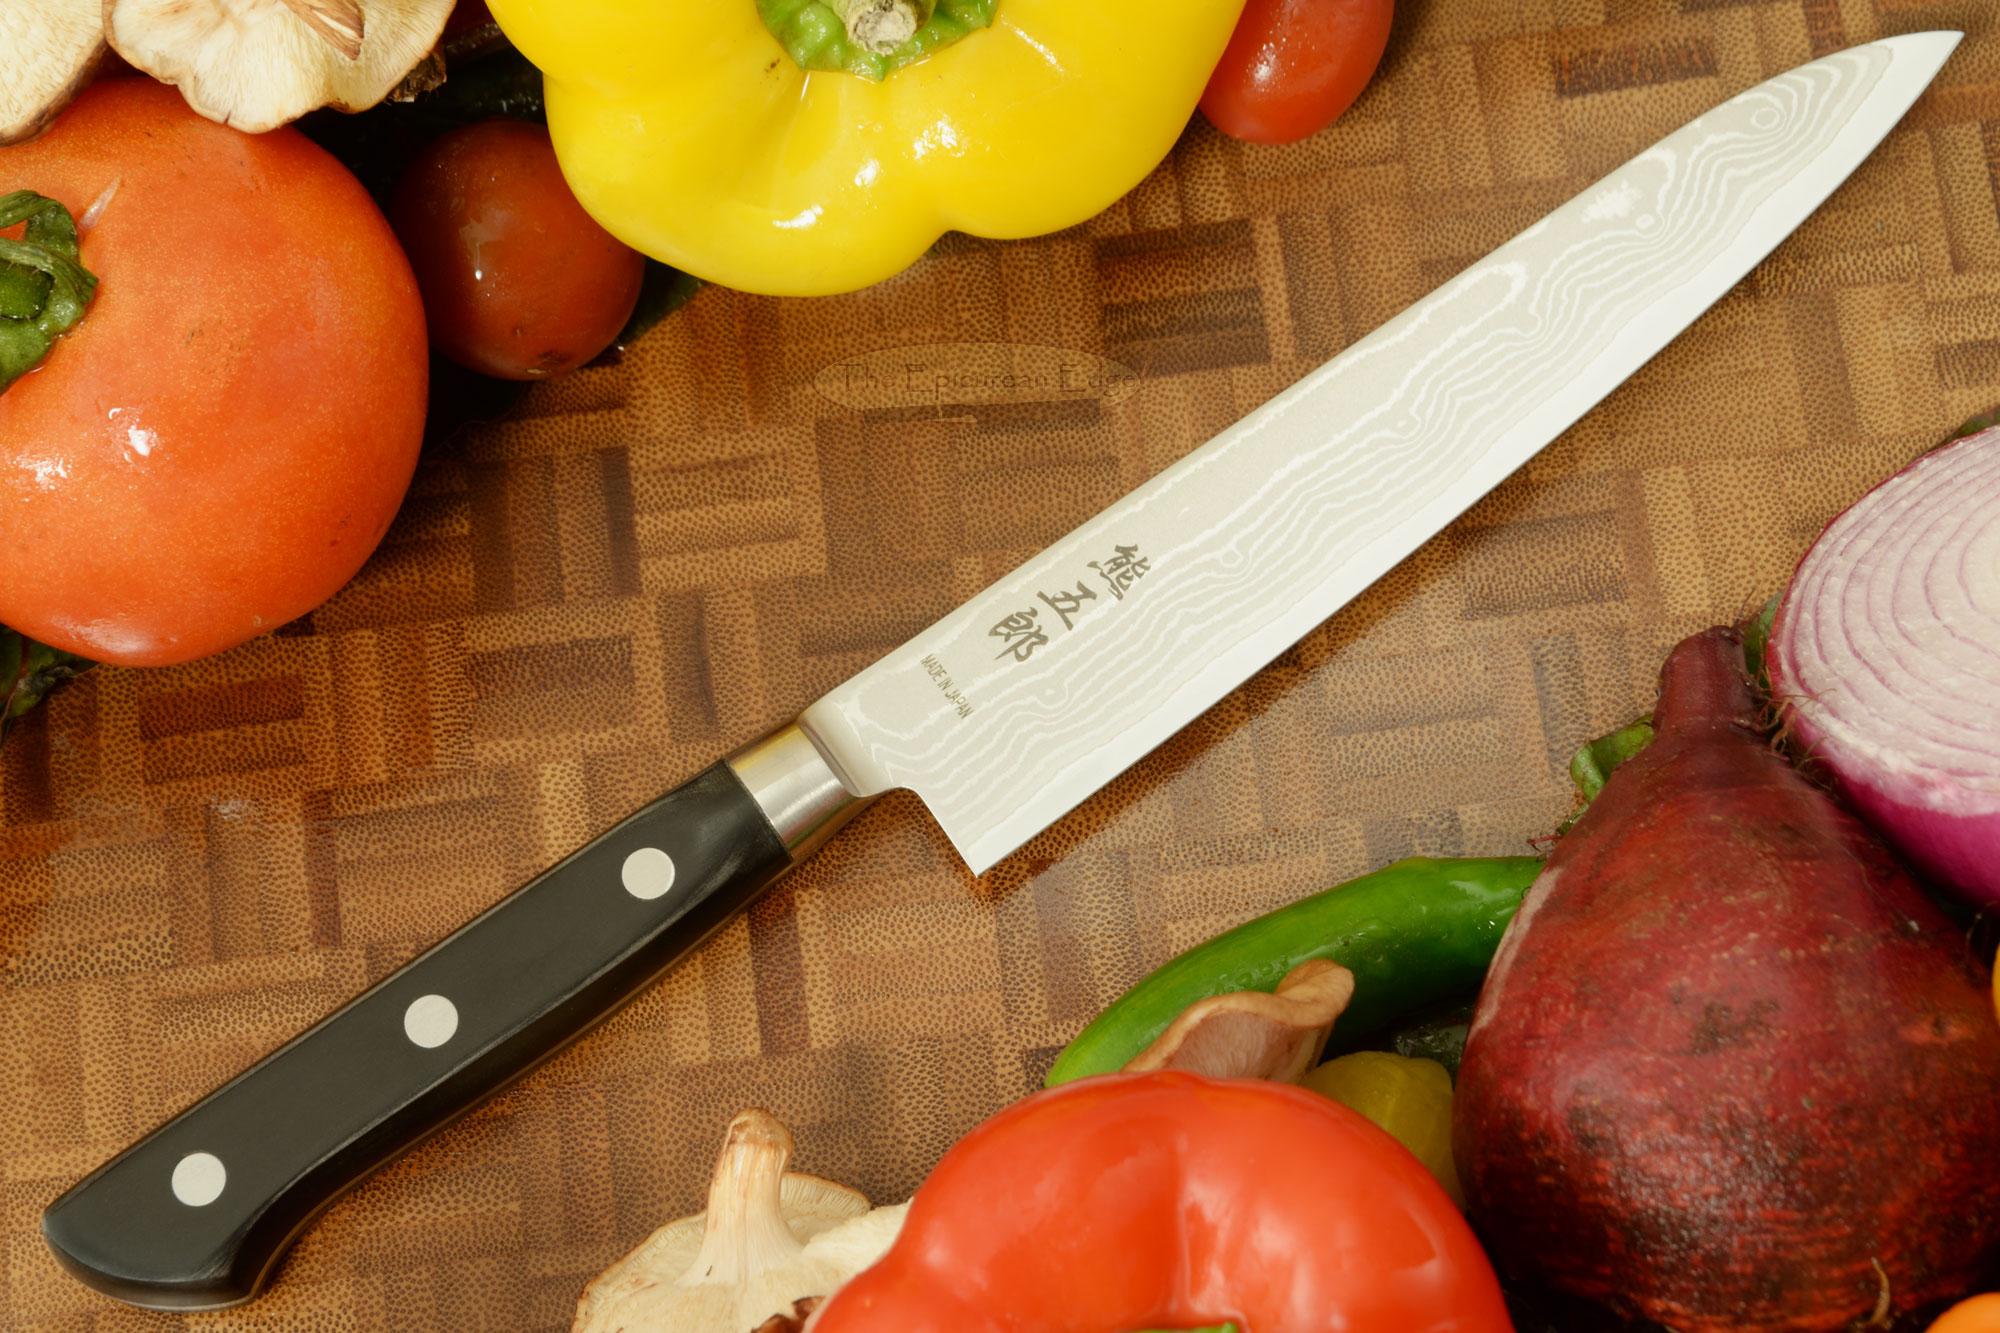 Kumagoro Suminagashi, San Mai Damascus Utility Knife - Fruit Knife - 6 in. (150mm)